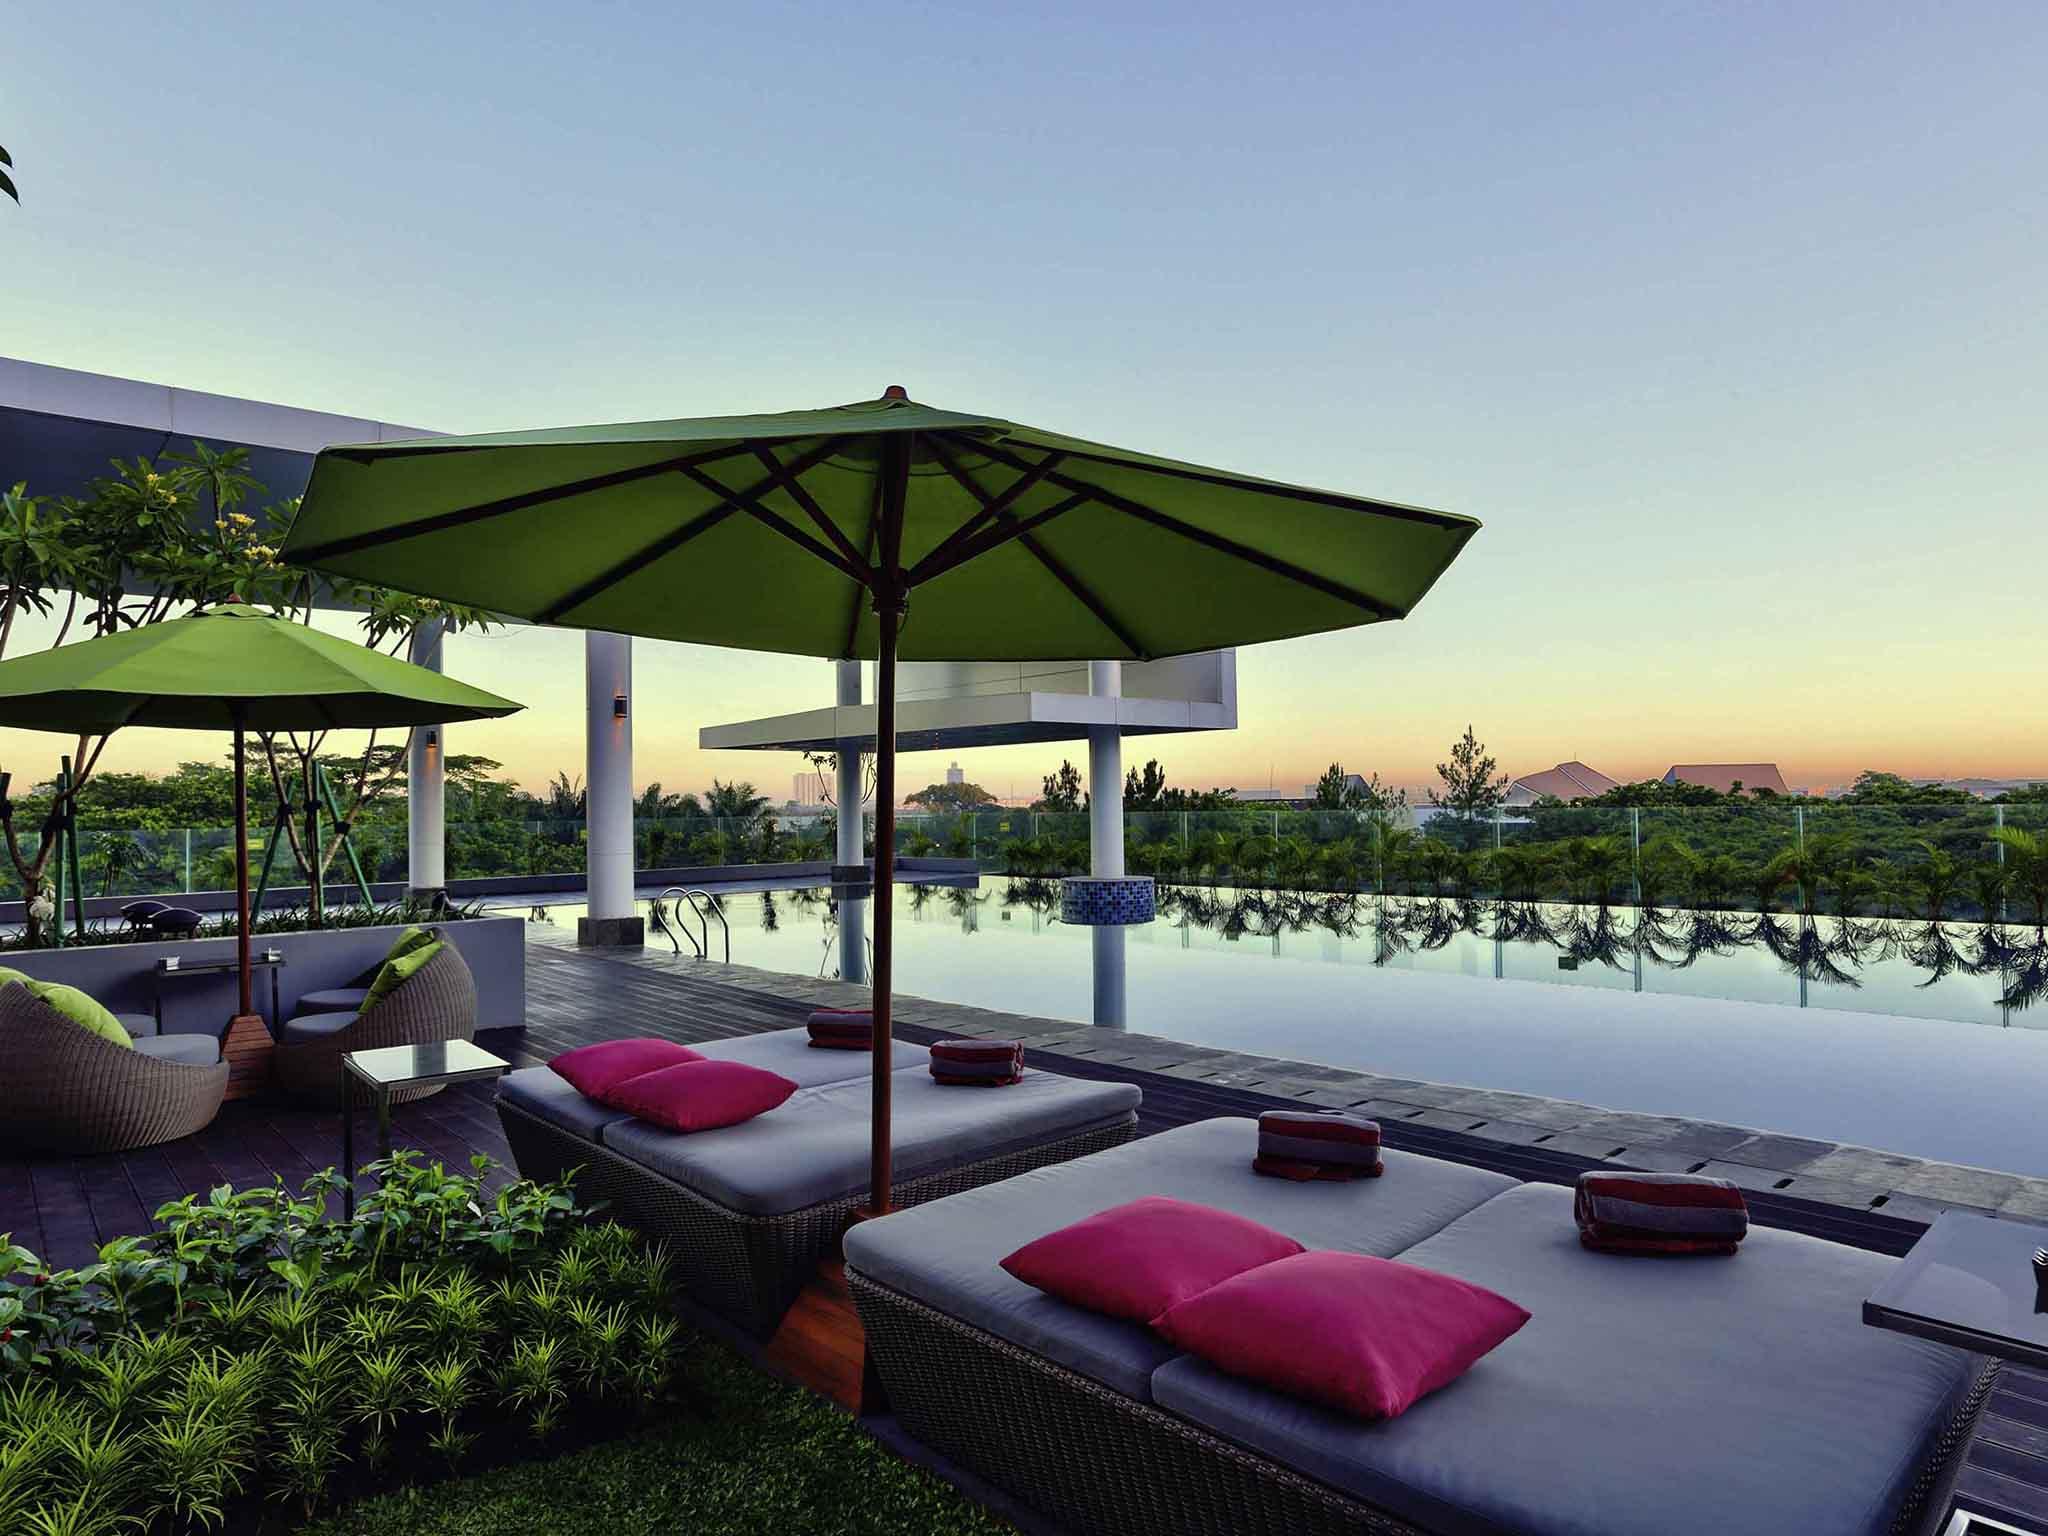 mercure serpong alam sutera 4 star international hotel rh accorhotels com